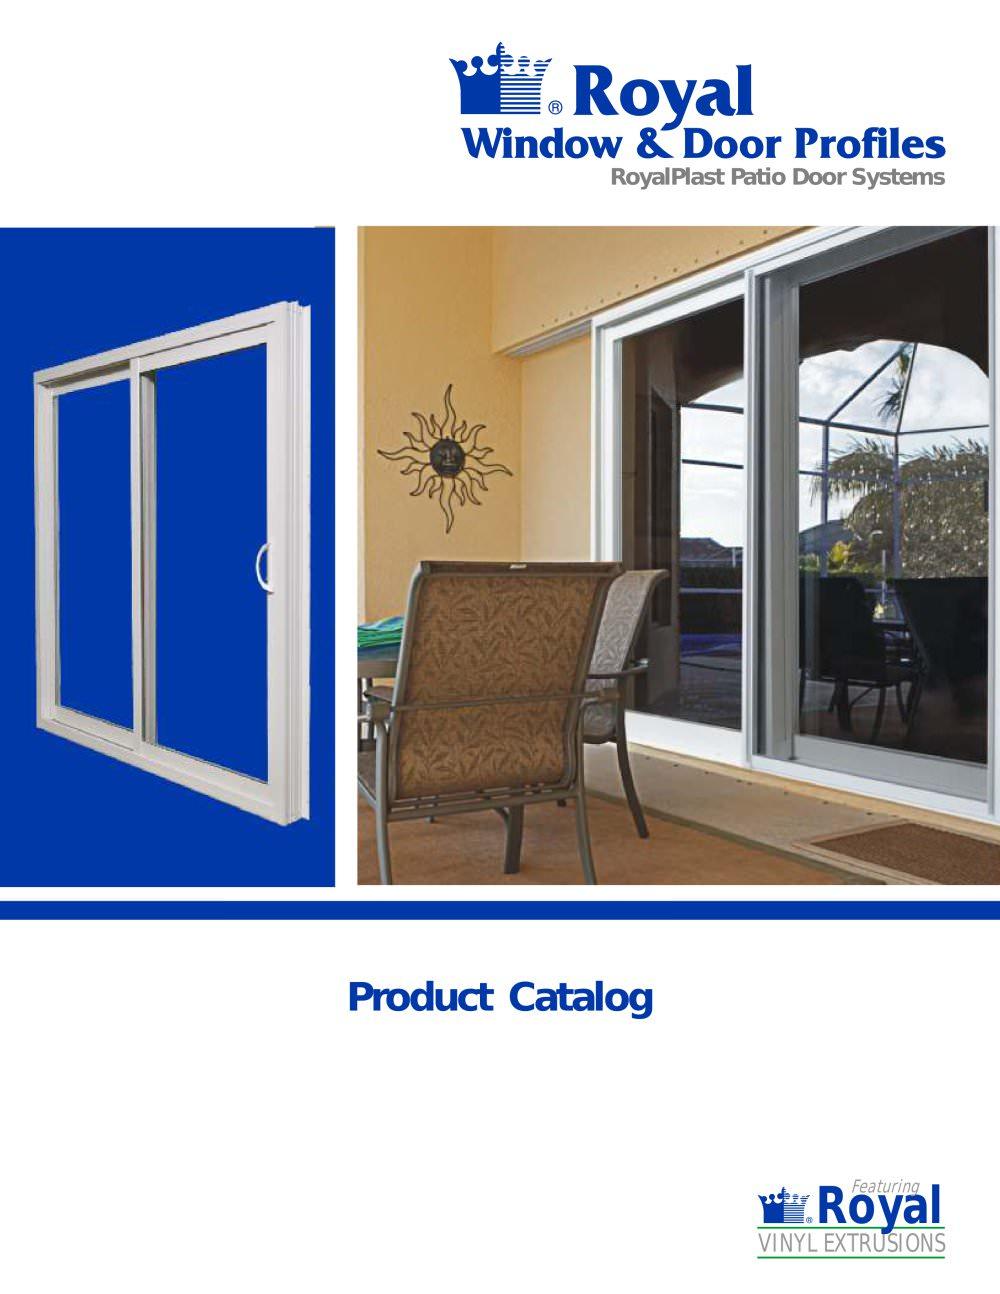 Patio Door Catalogue   1 / 8 Pages